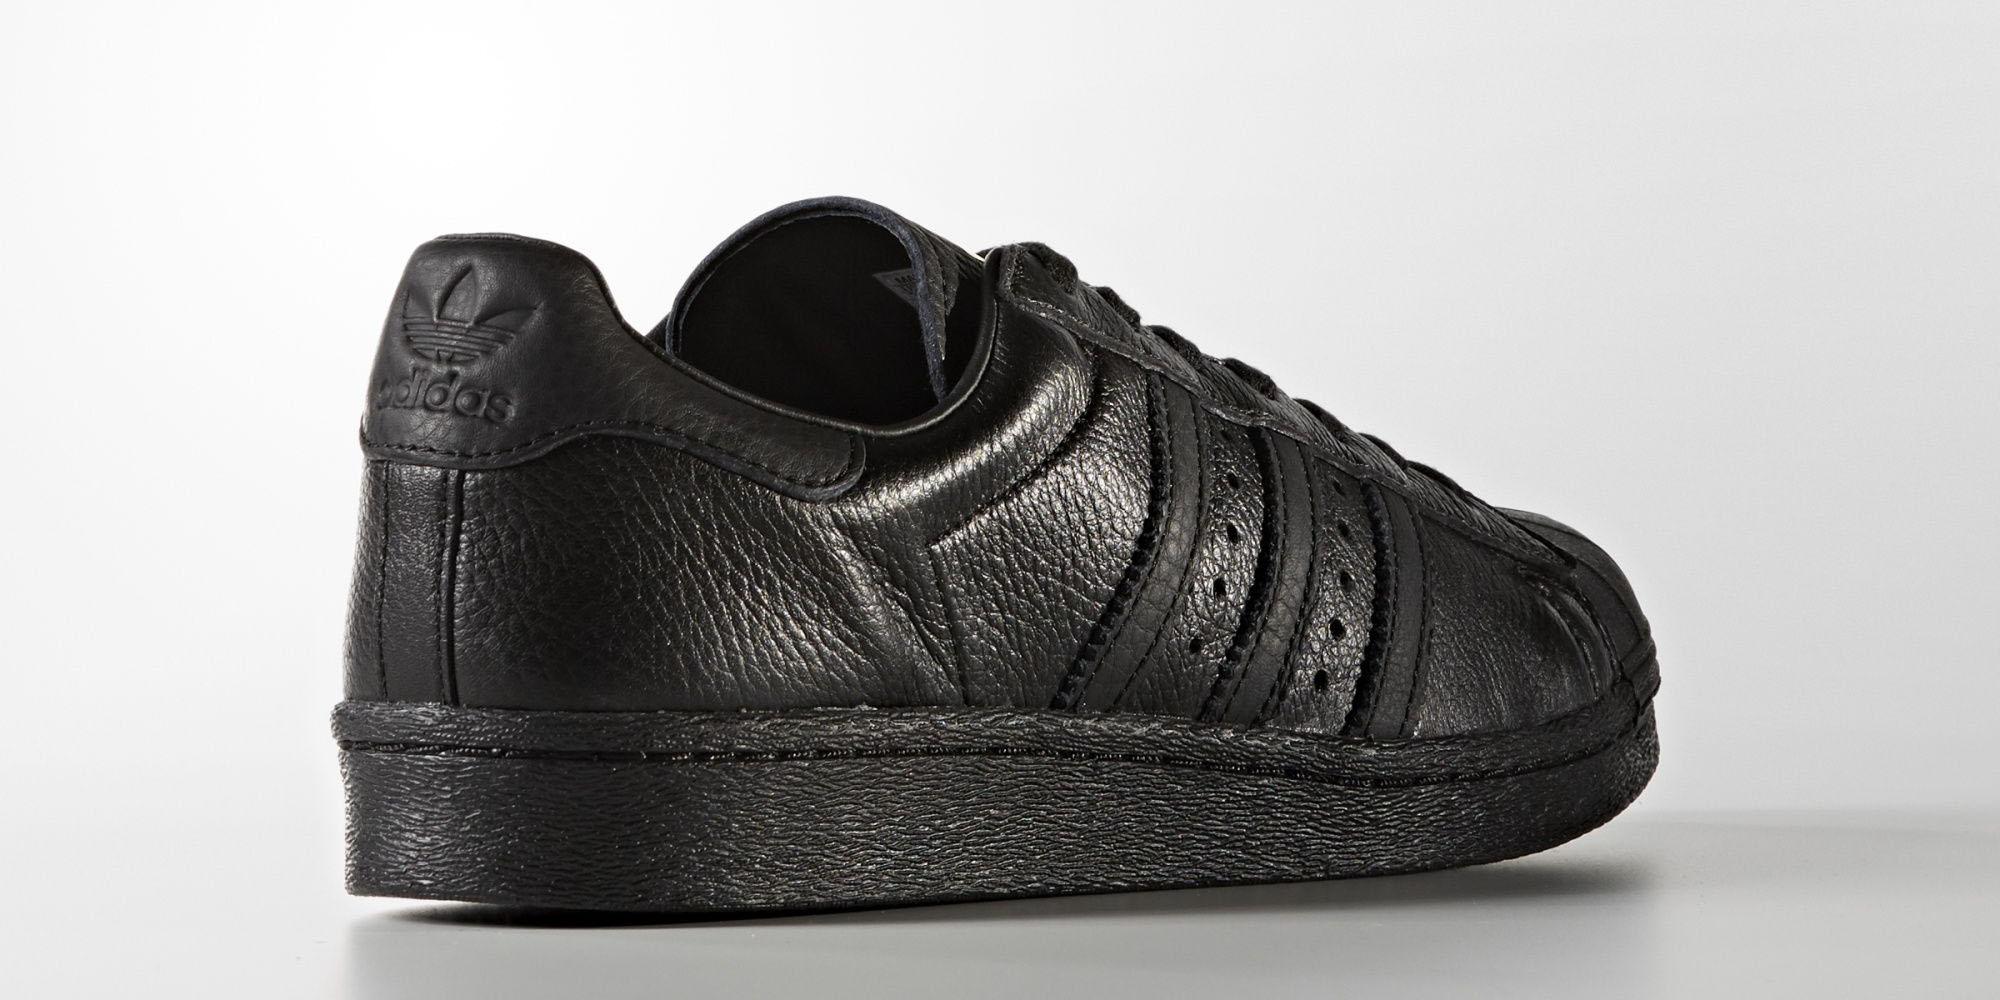 Adidas Superstar Boost Triple Black